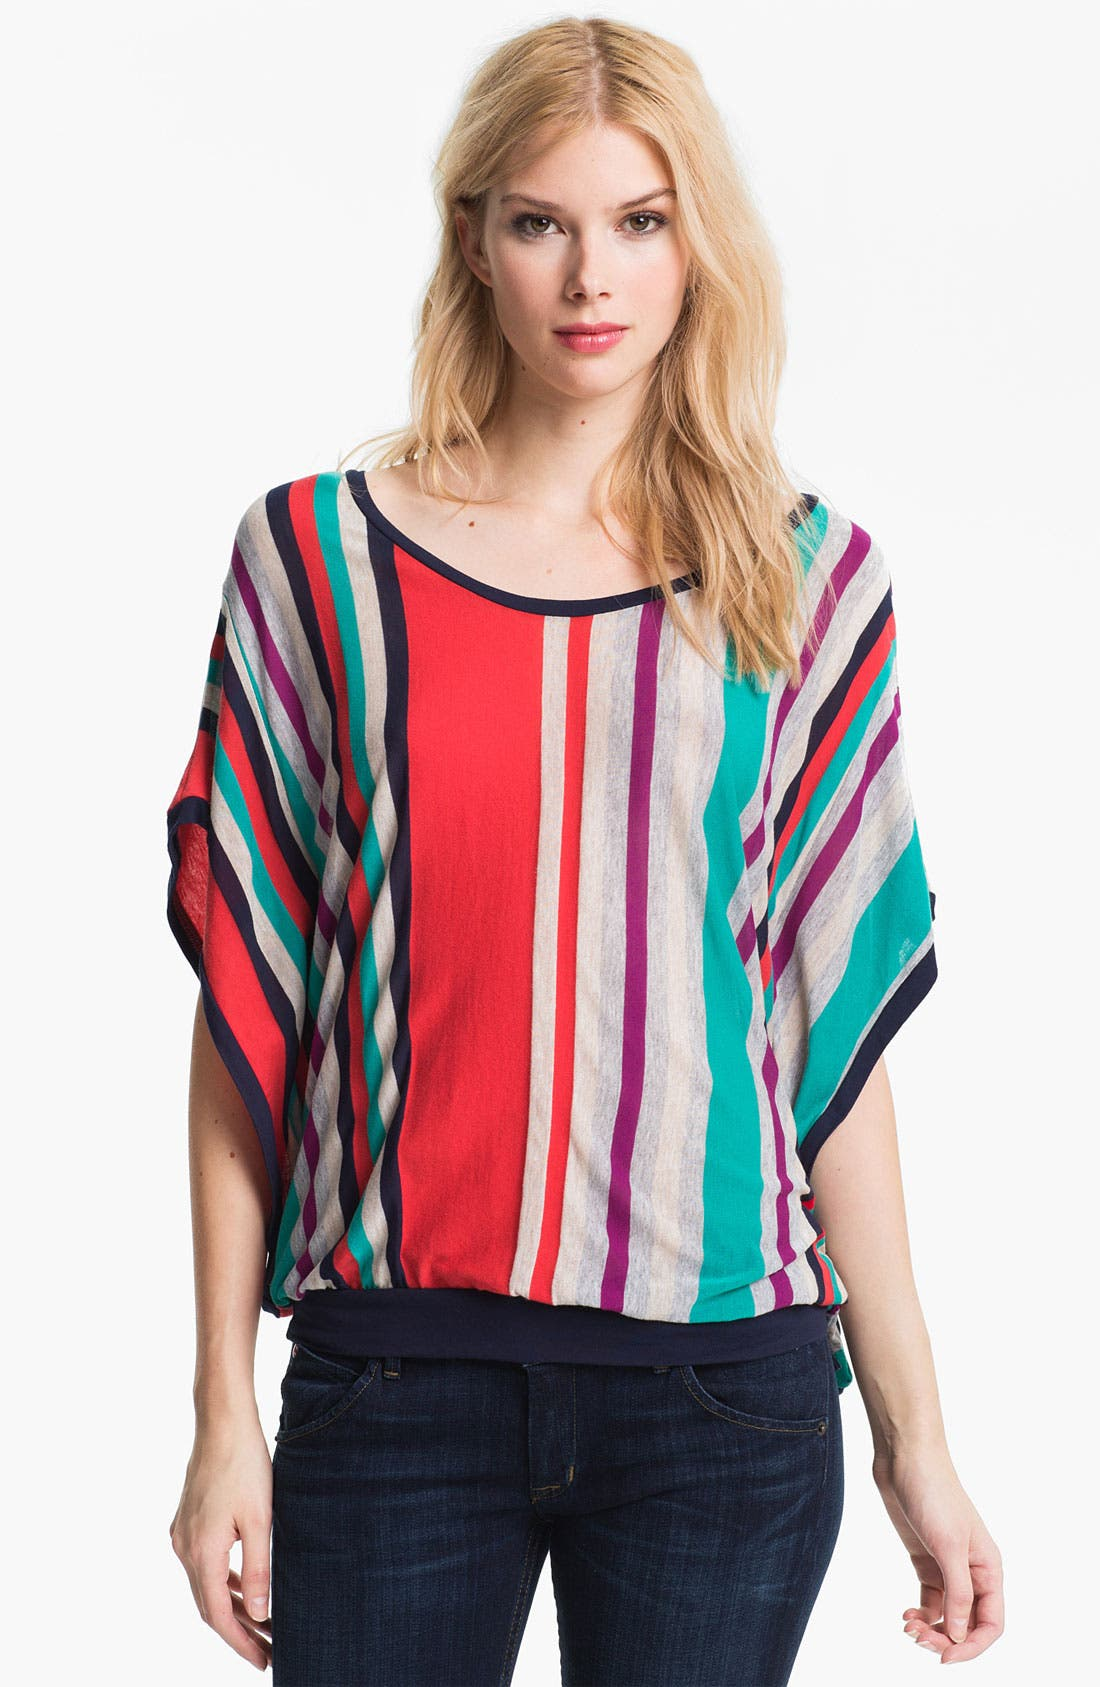 Alternate Image 1 Selected - Ella Moss 'Zoey' Stripe Top